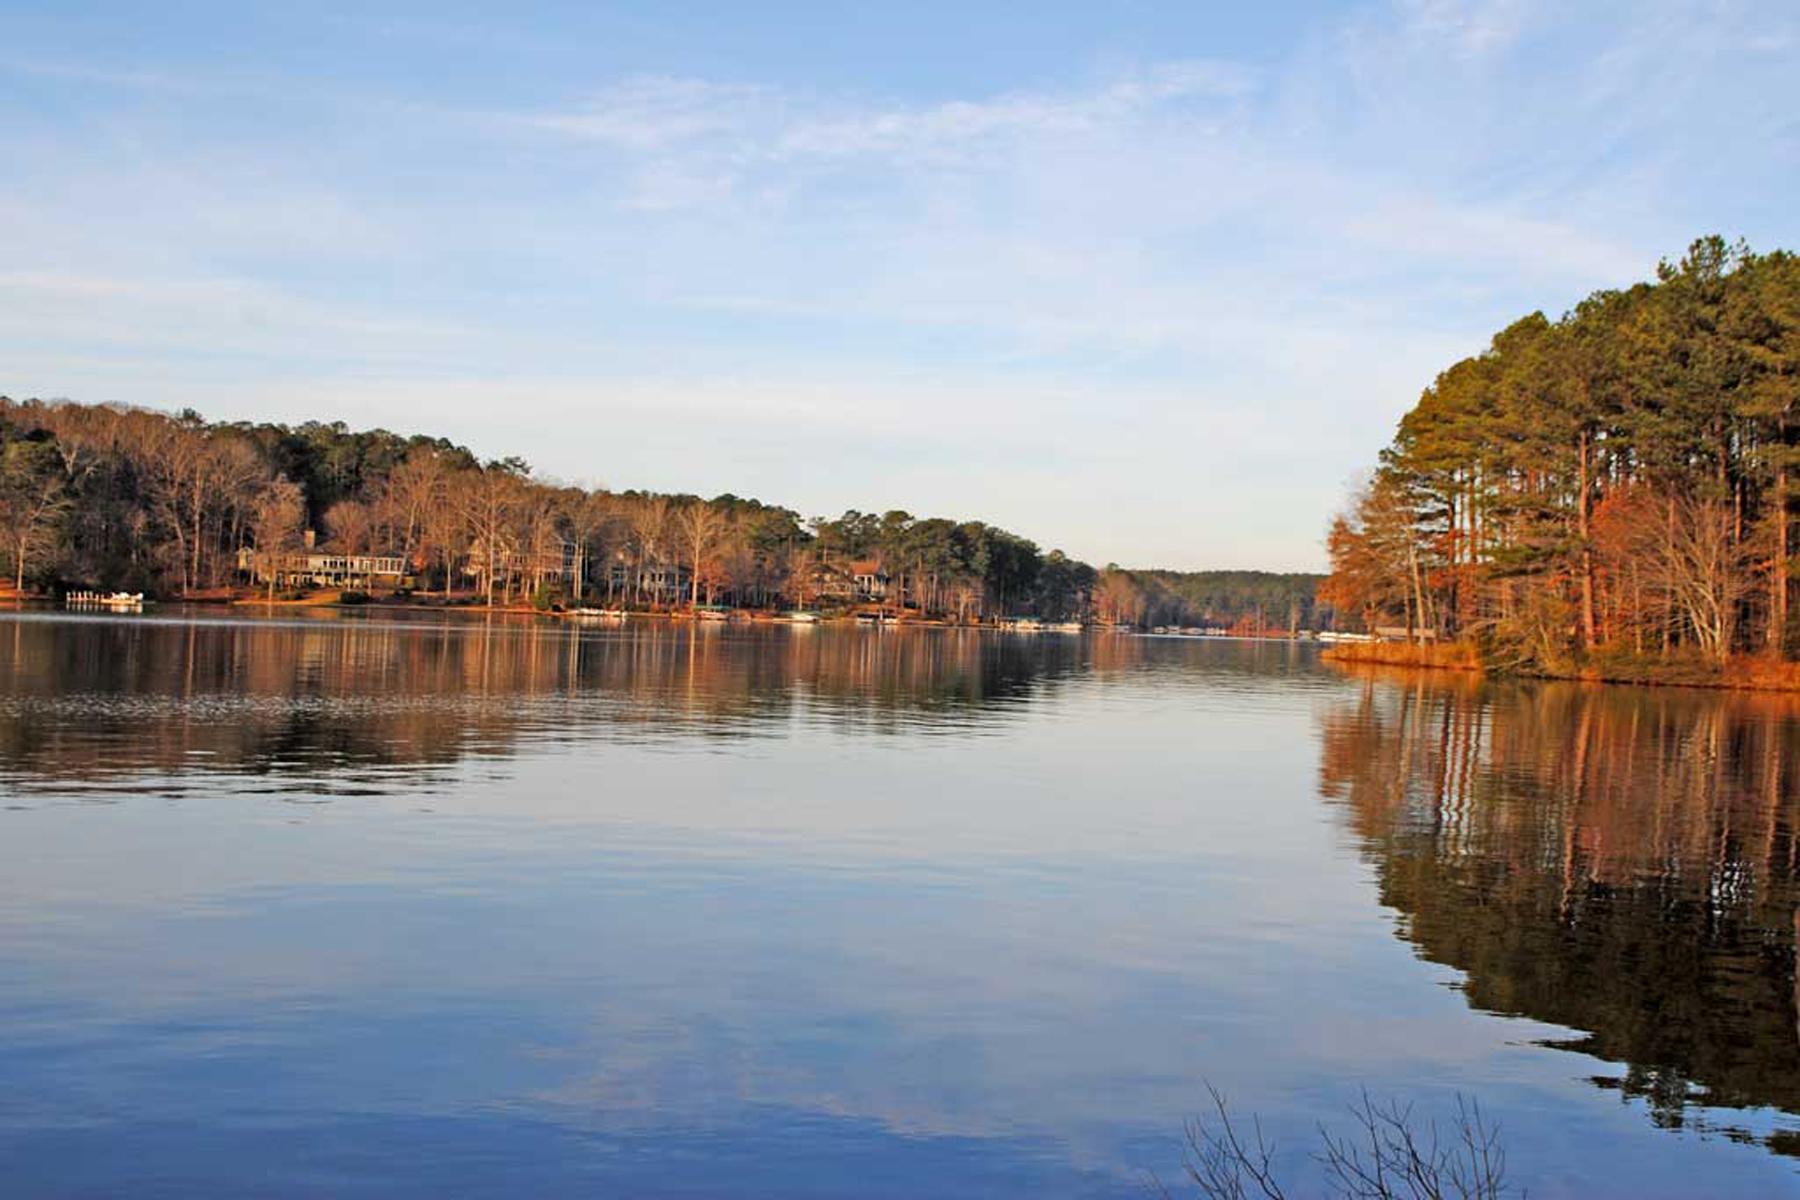 Terreno per Vendita alle ore Beautiful Lake Front Lot 1091 Hawthorne Heights Road Greensboro, Georgia, 30642 Stati Uniti